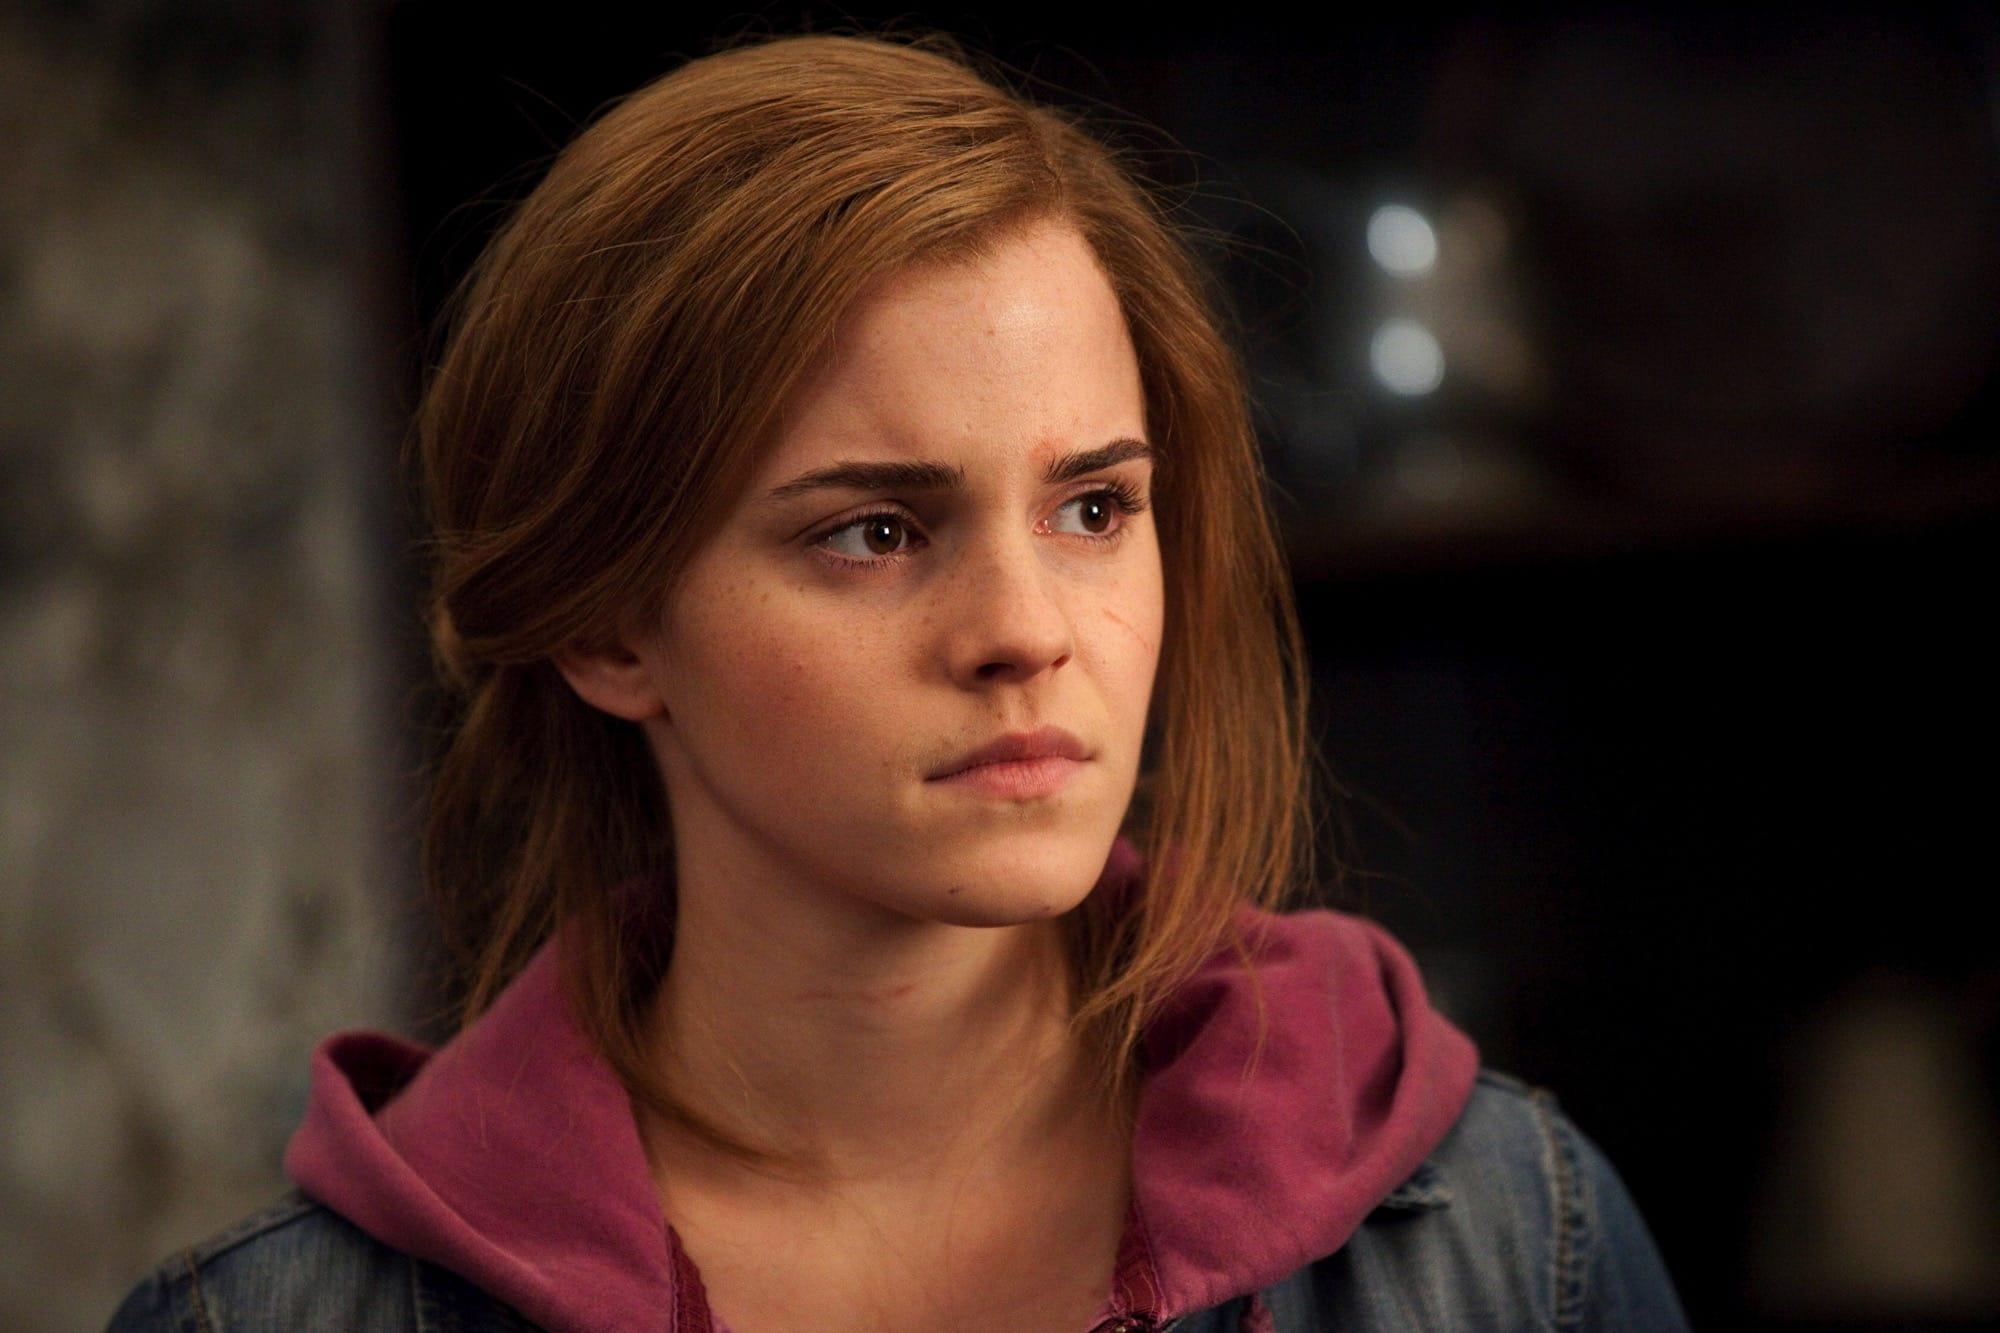 Harry-Potter-Hermione-Granger-hero